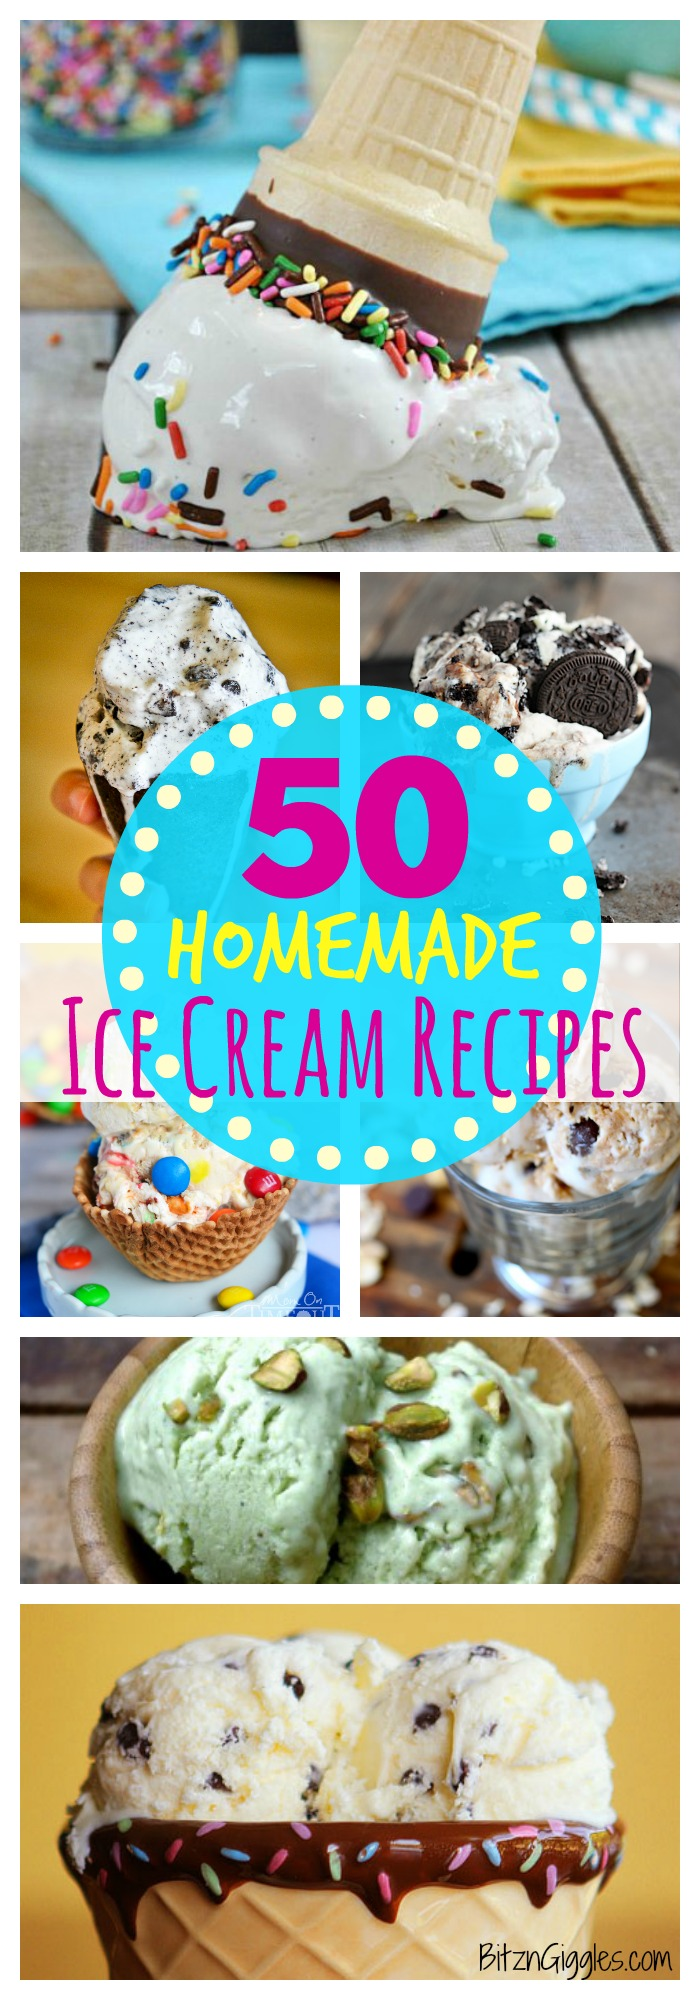 Homemade Ice Cream Recipes - Bitz & Giggles